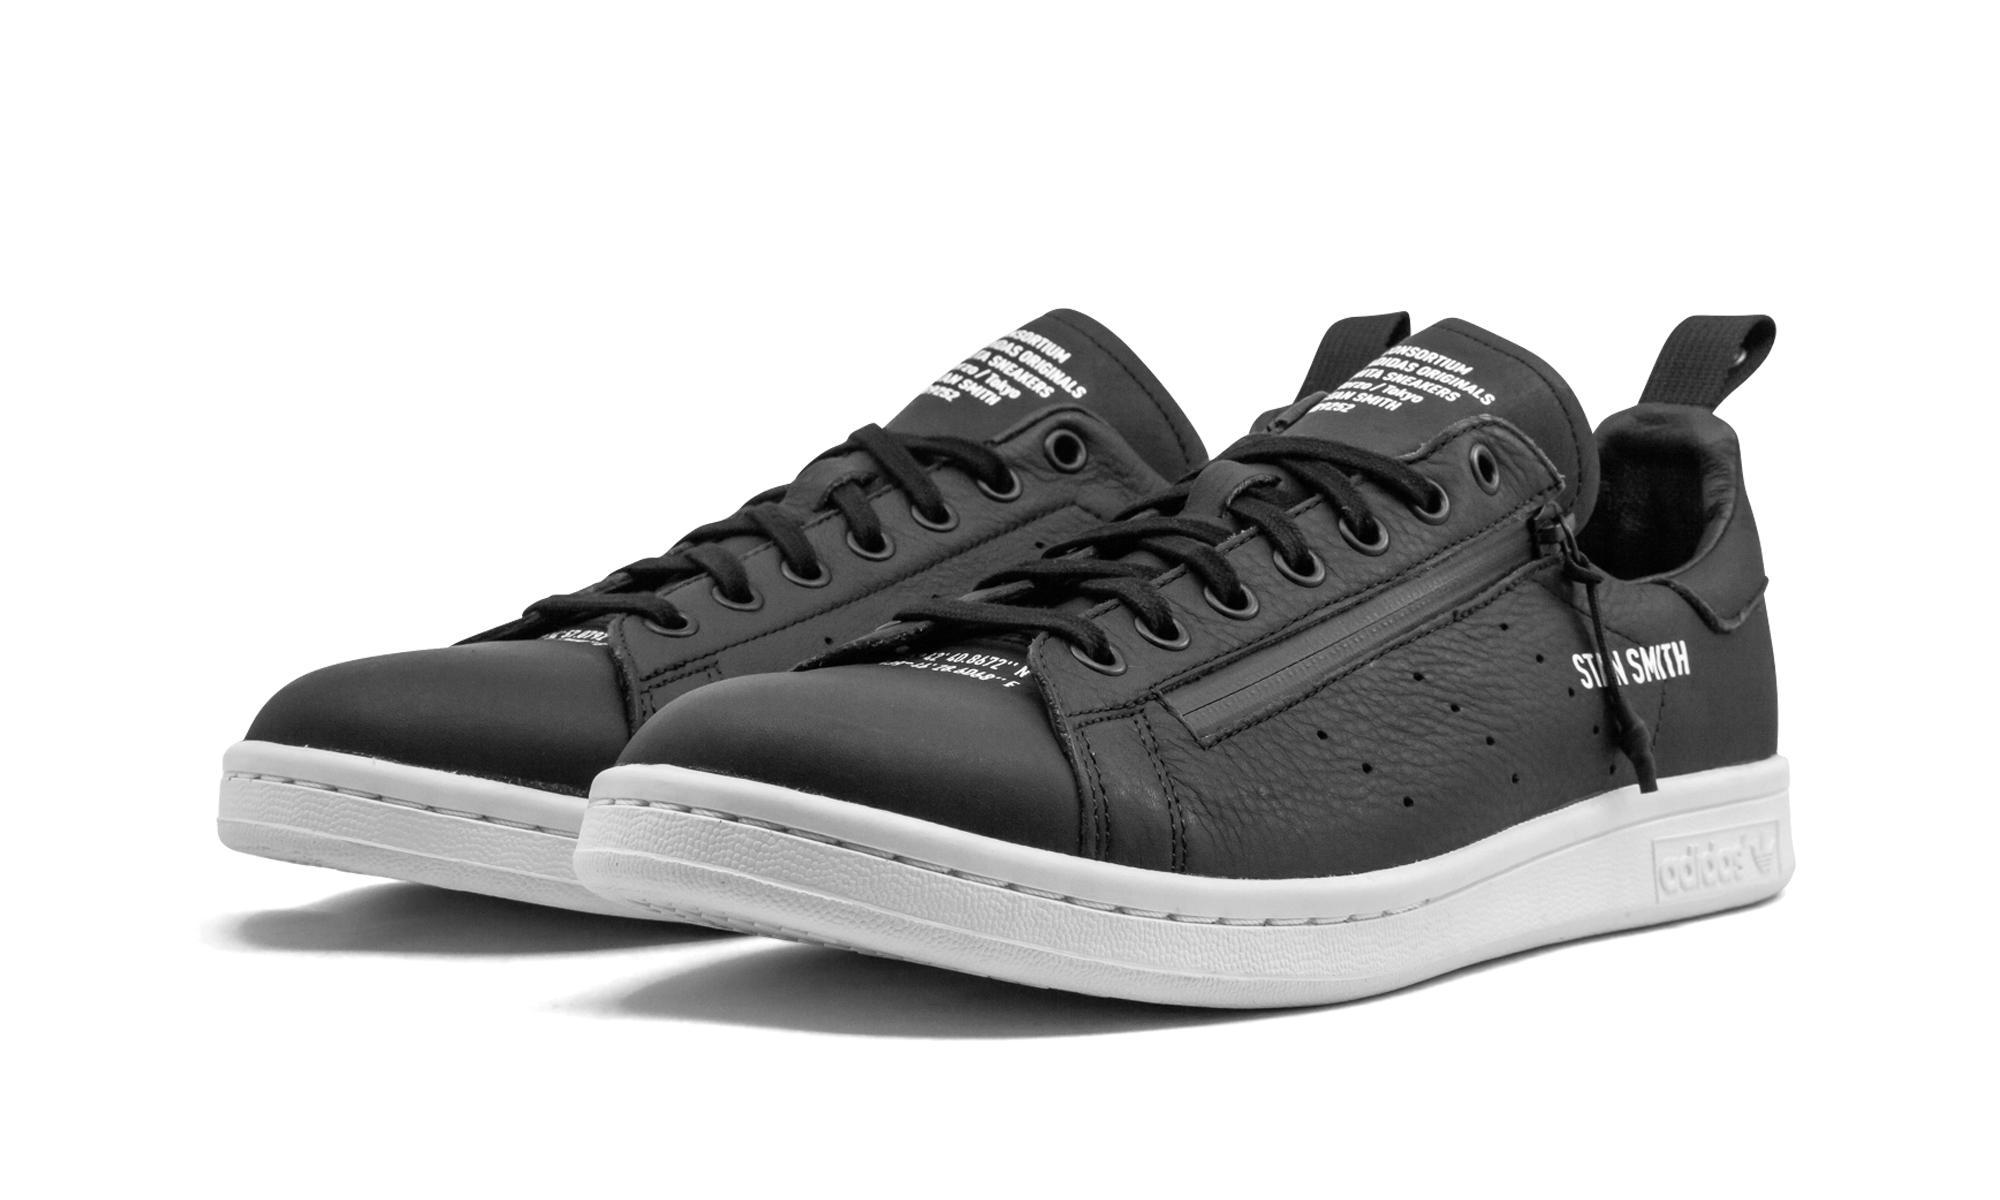 reputable site 8a88f fd317 adidas Stan Smith Mita in Black for Men - Lyst